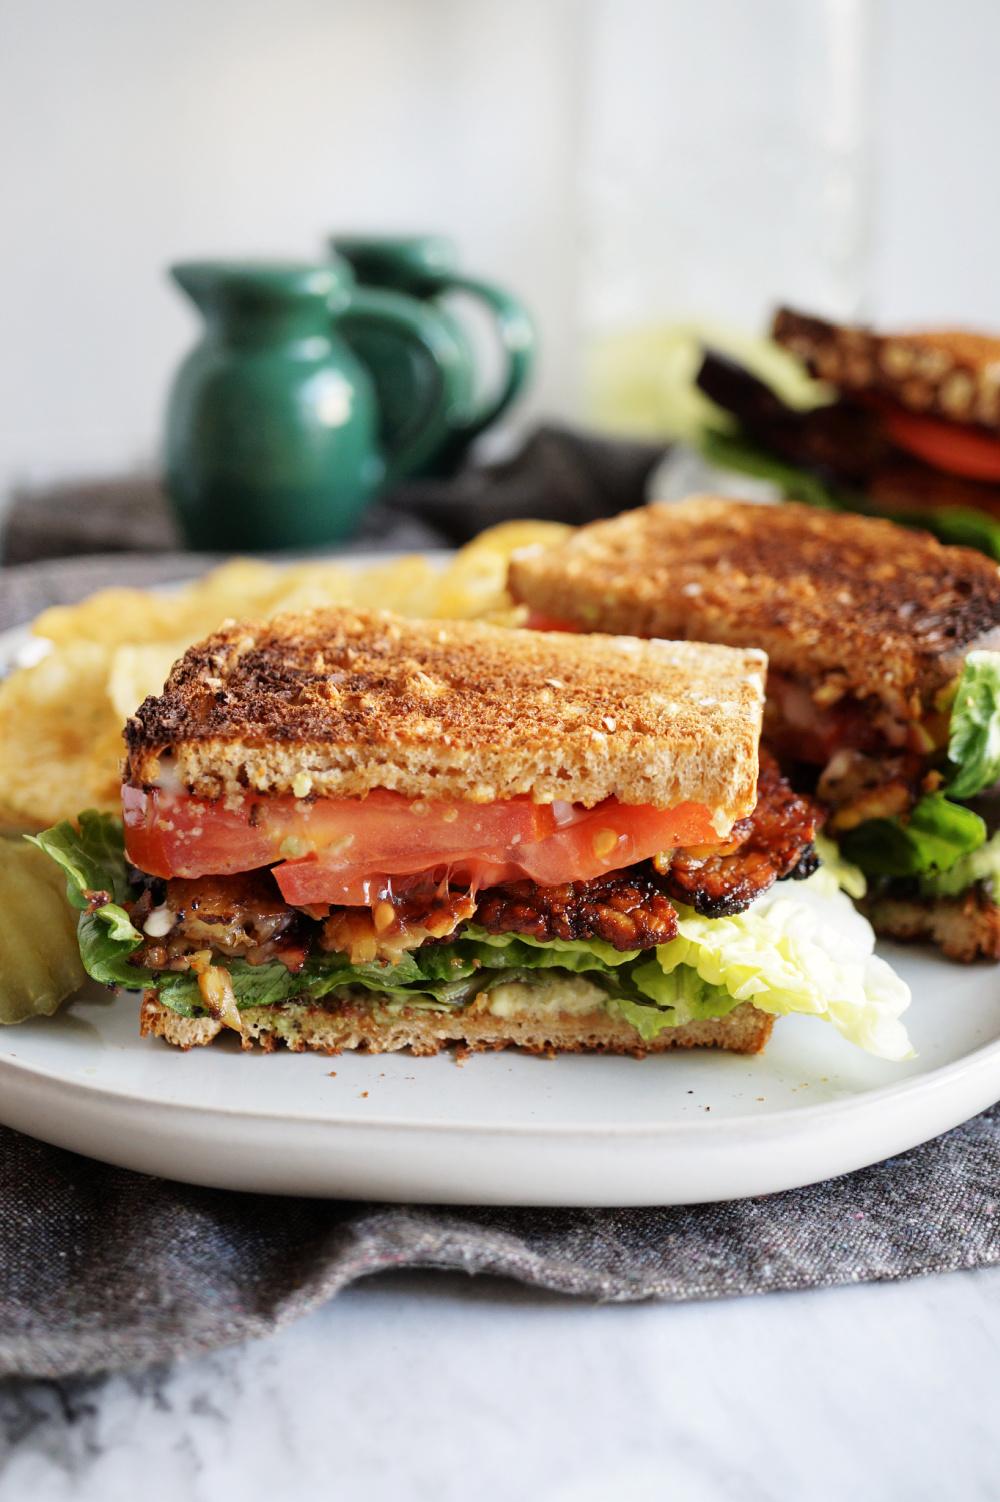 BLT sandwich cut in half on white plate